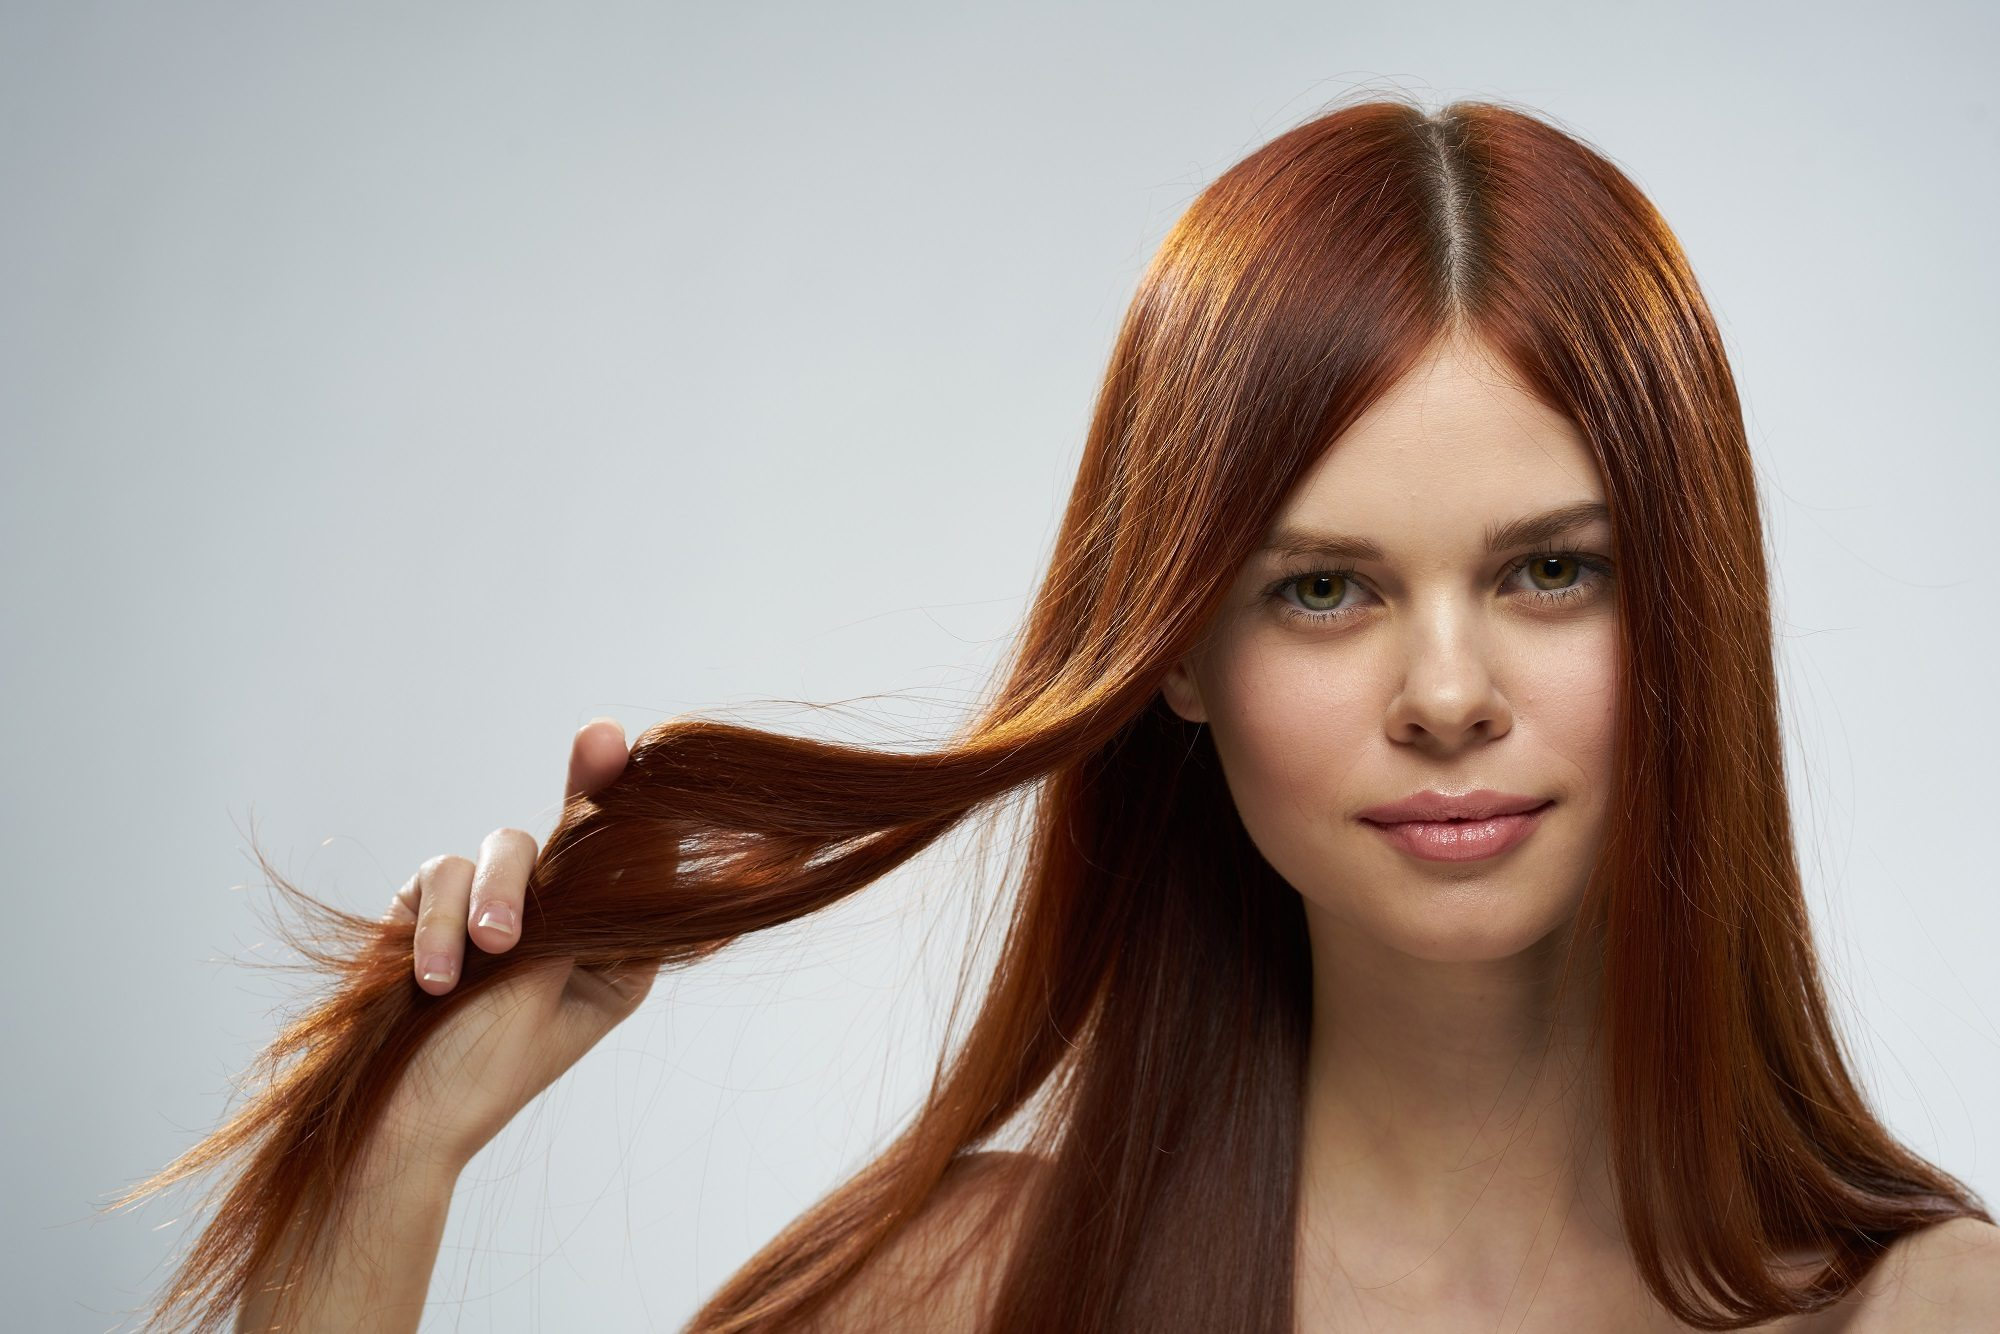 Woman with long straight cinnamon hair